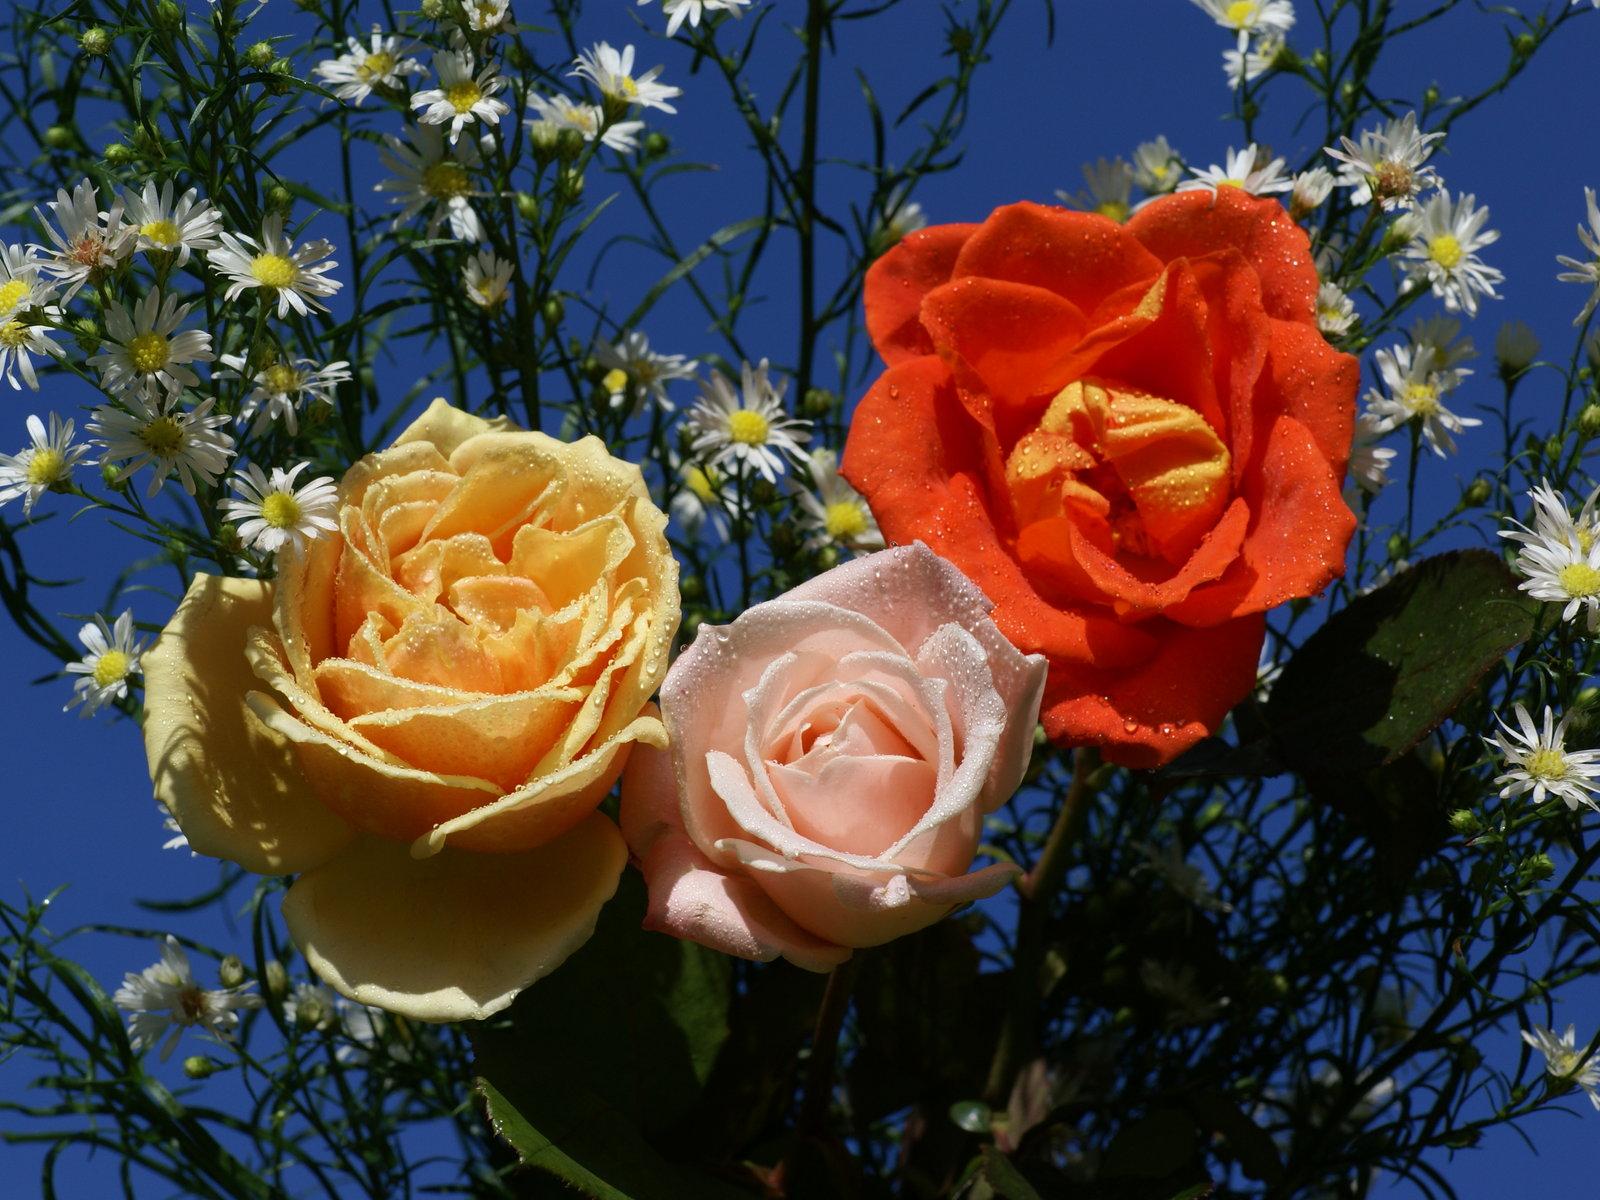 Flores - Fondos Flores - Fondos de Pantalla - Imagenes